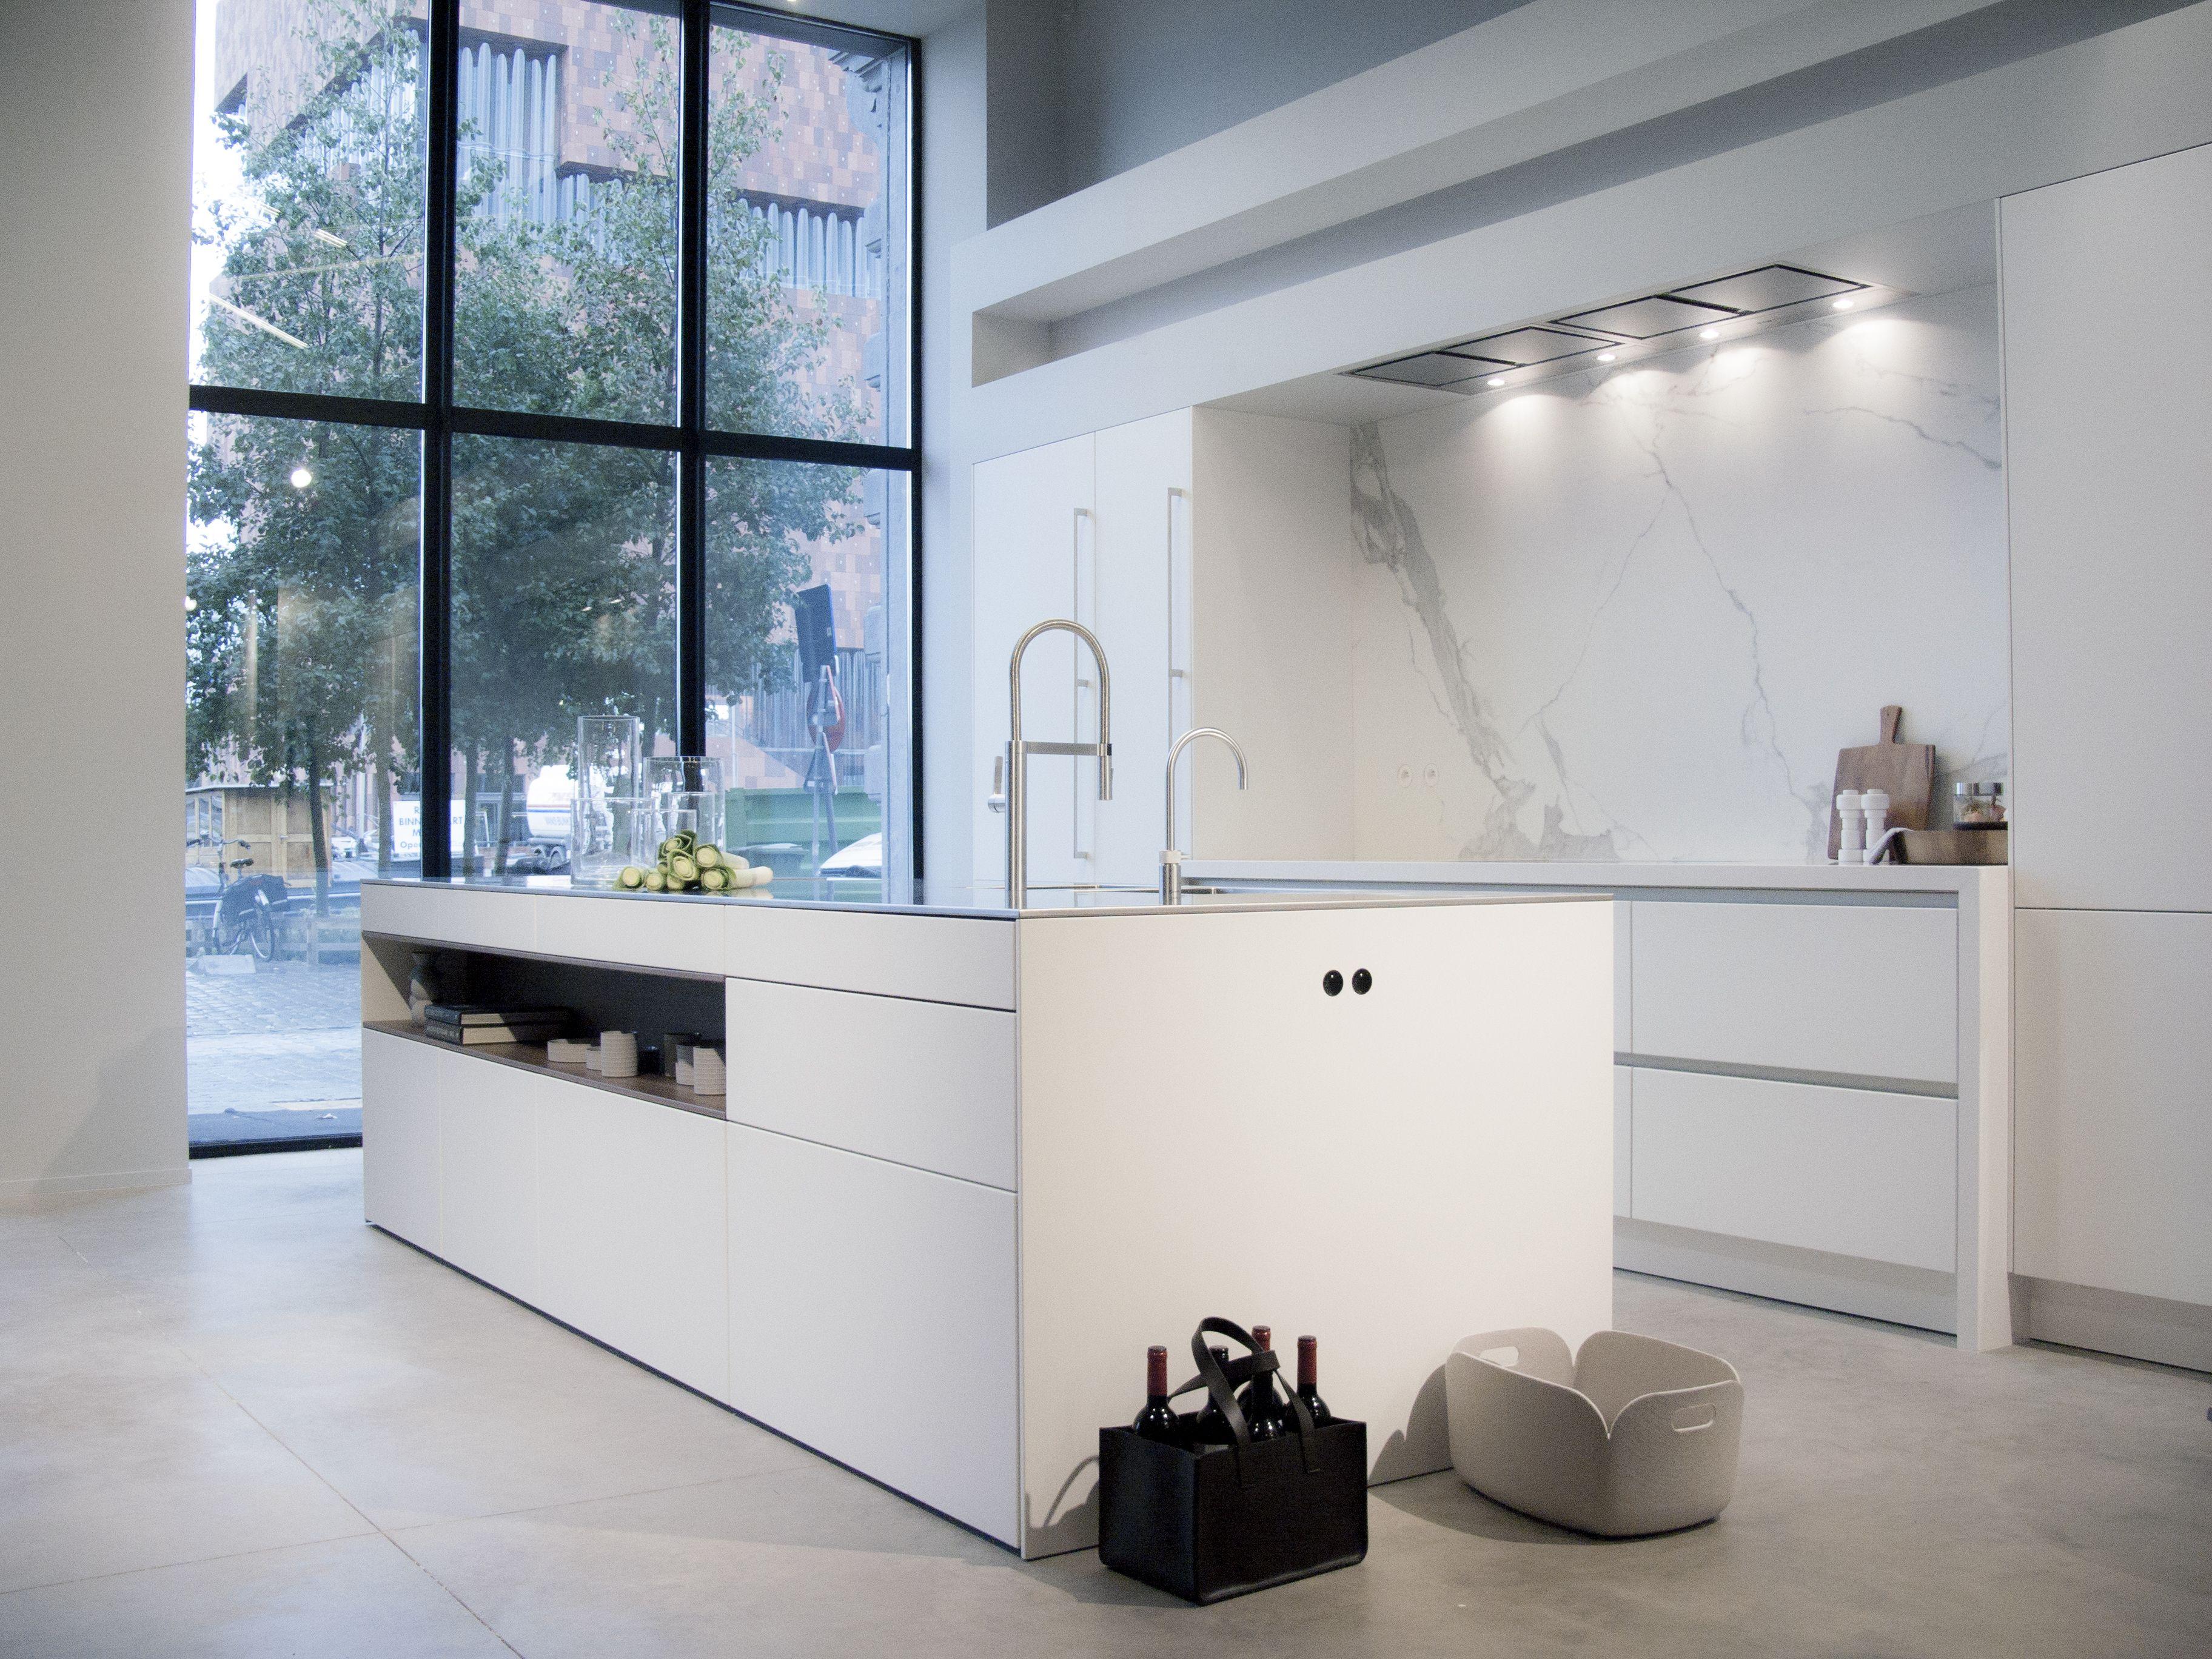 SieMatic PURE in lotus white, worktop inox & composite \